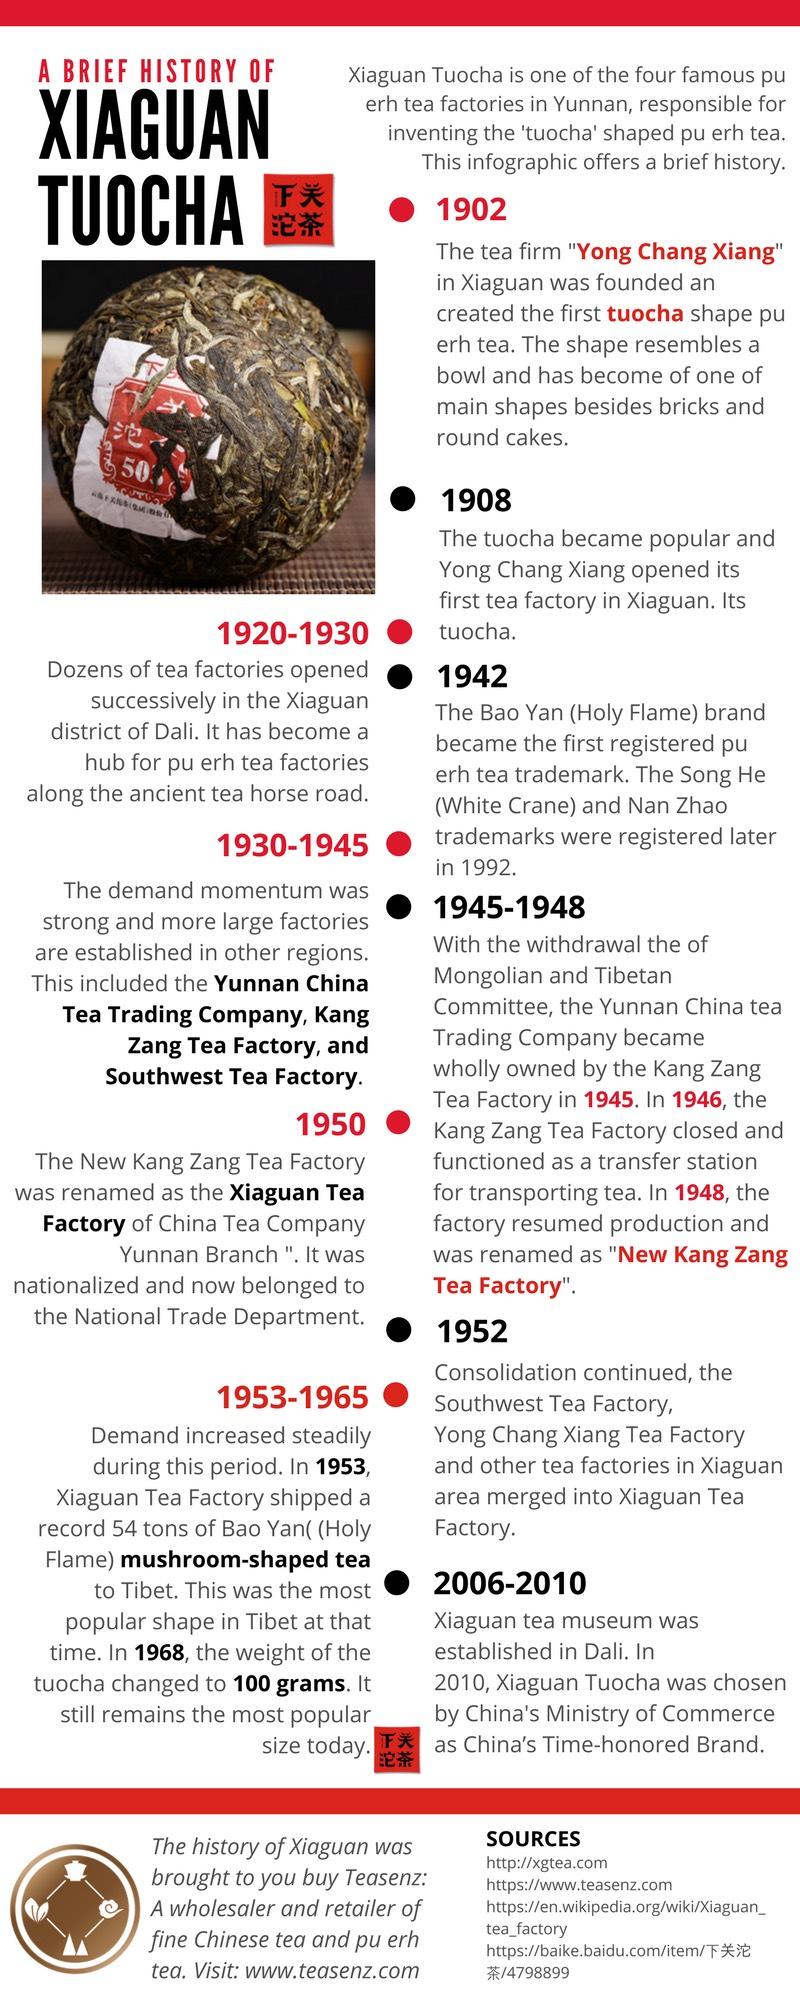 xiaguan tuocha tea history infographic